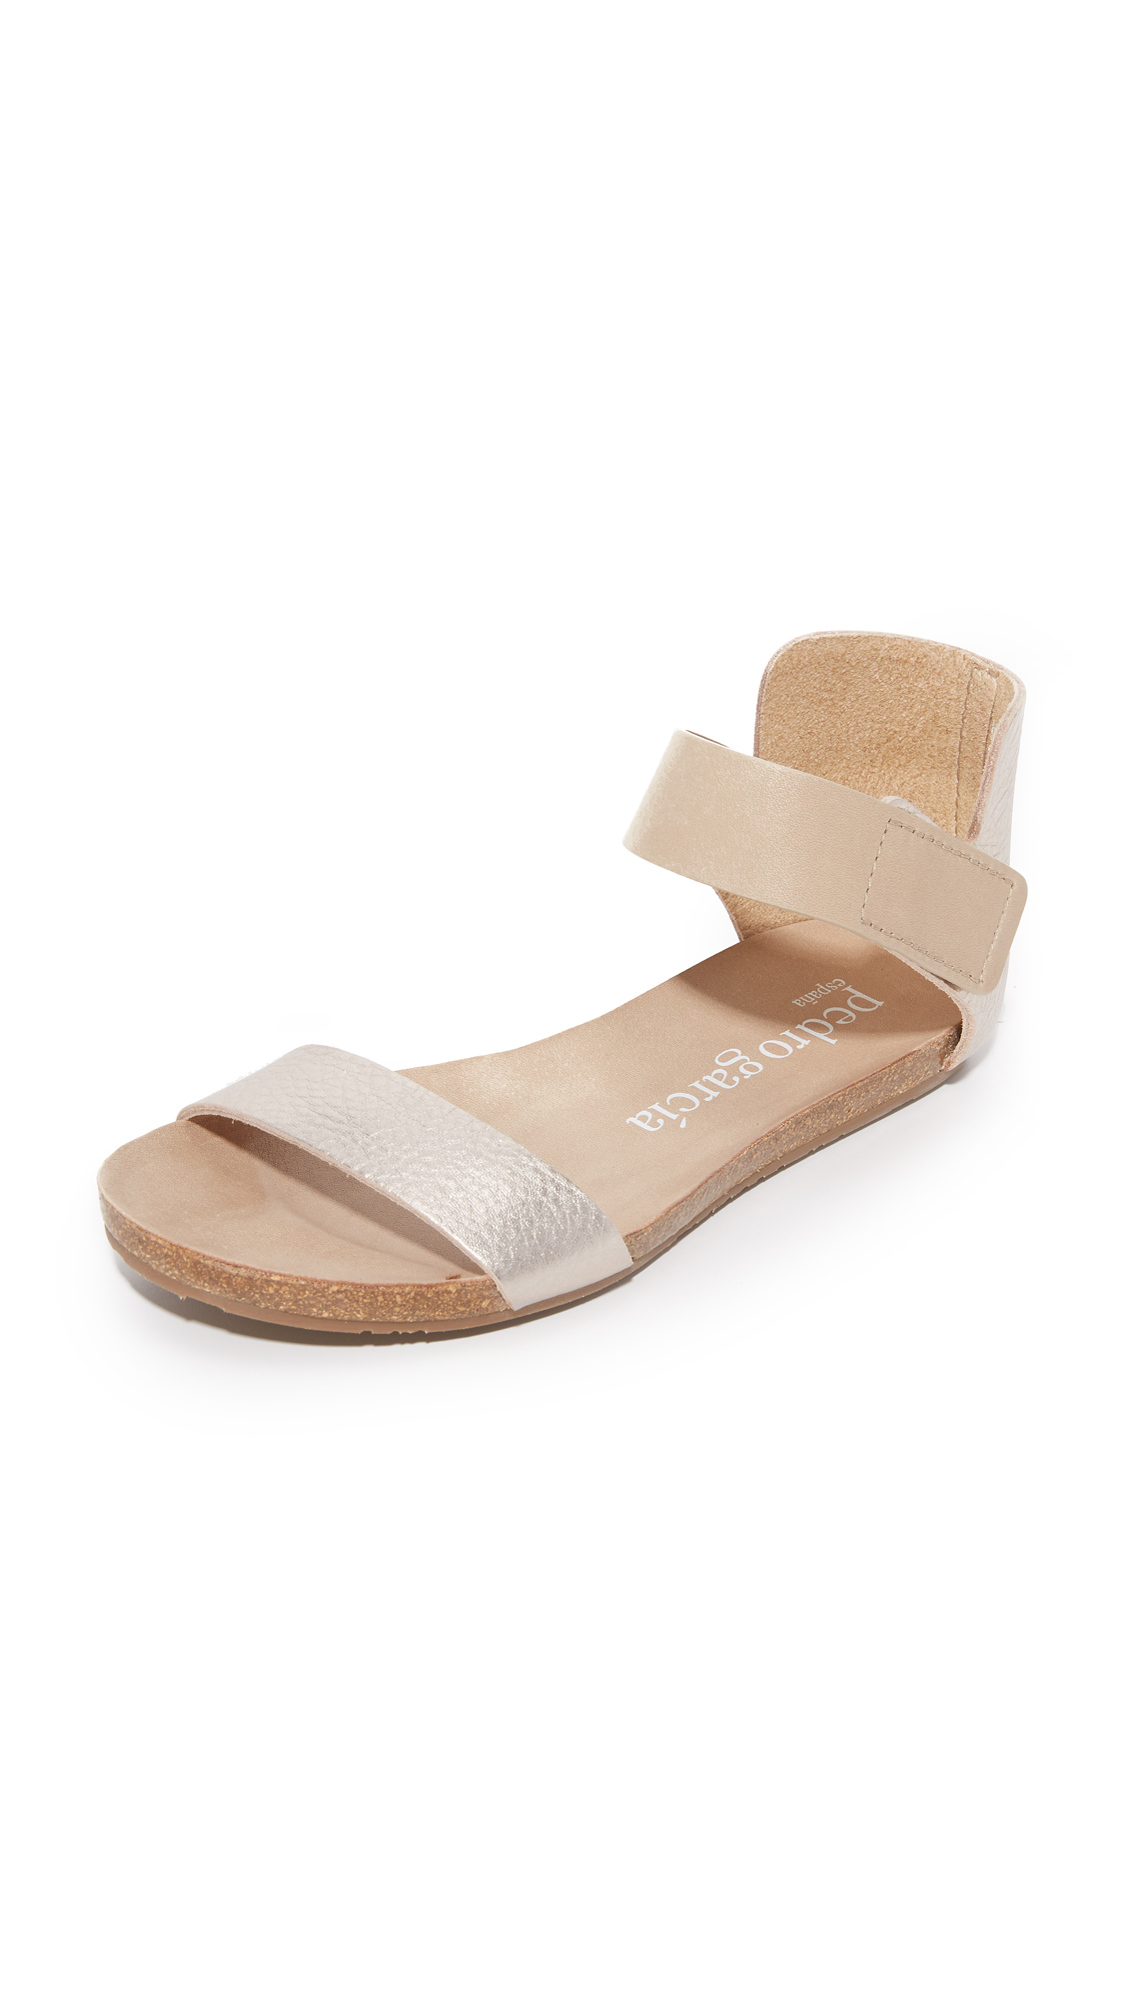 Pedro Garcia Juncal Flat Sandals - Sirocco